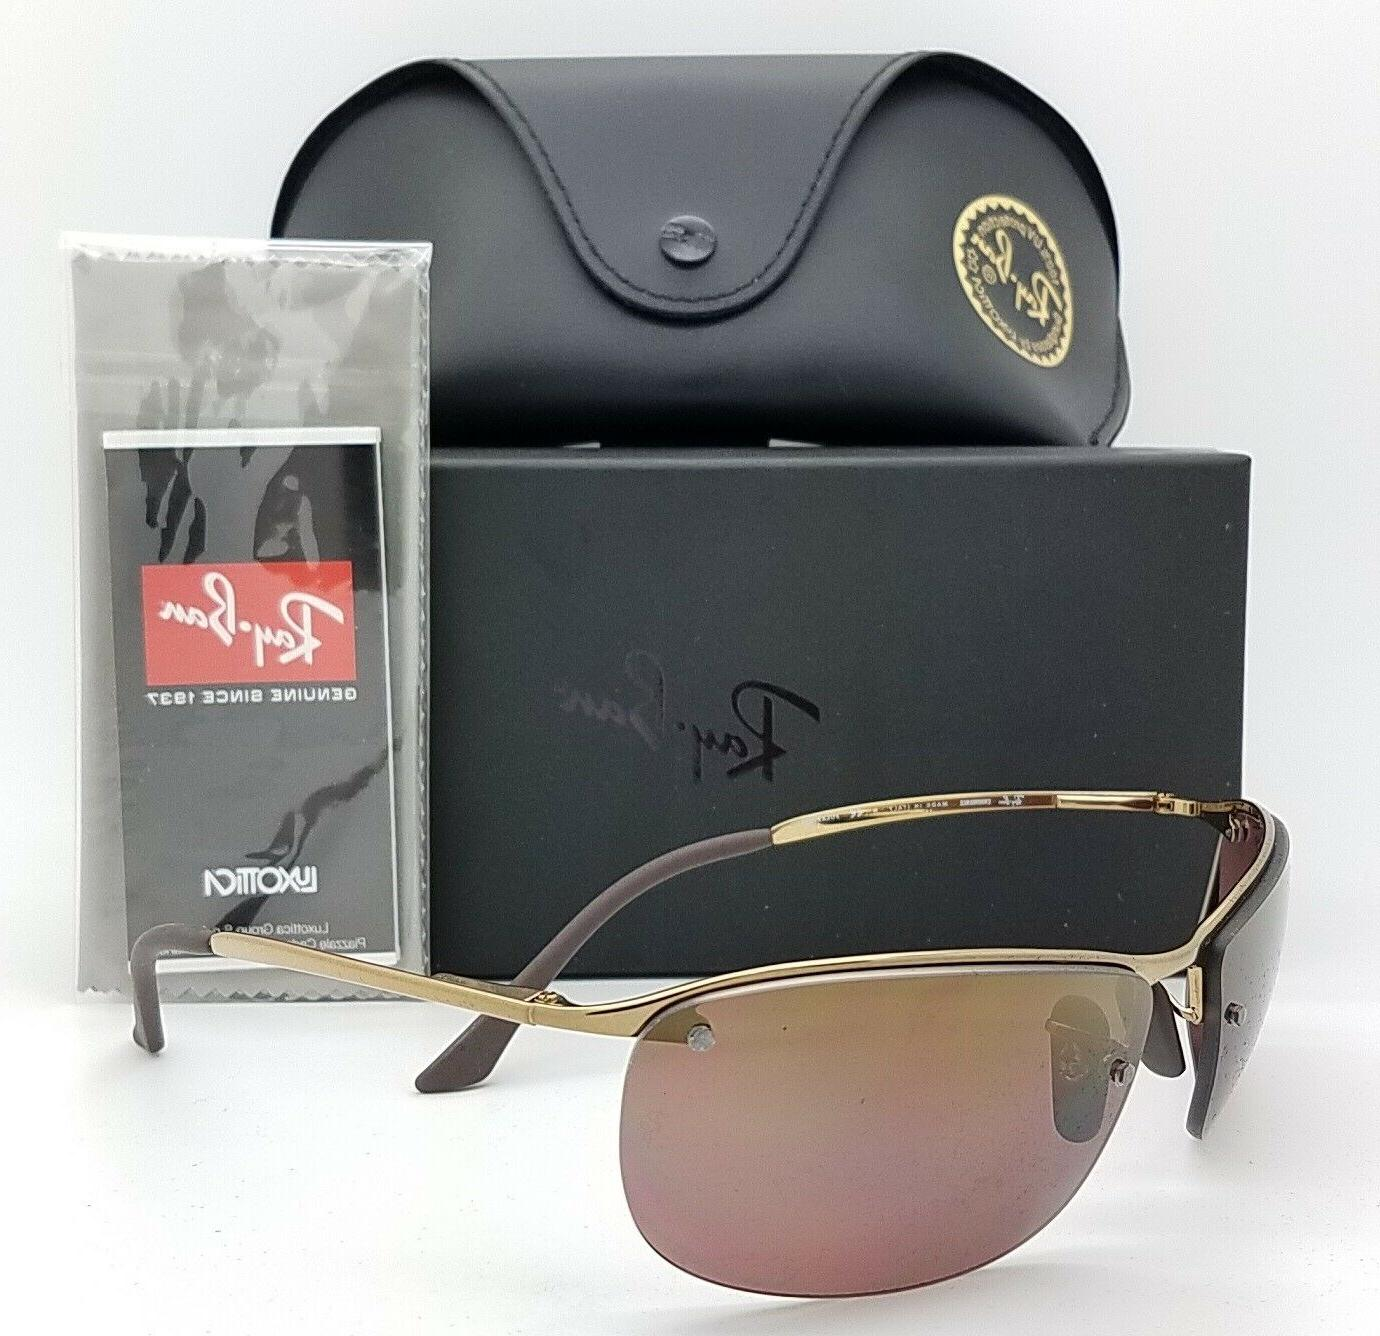 ray ban chromance sunglasses price